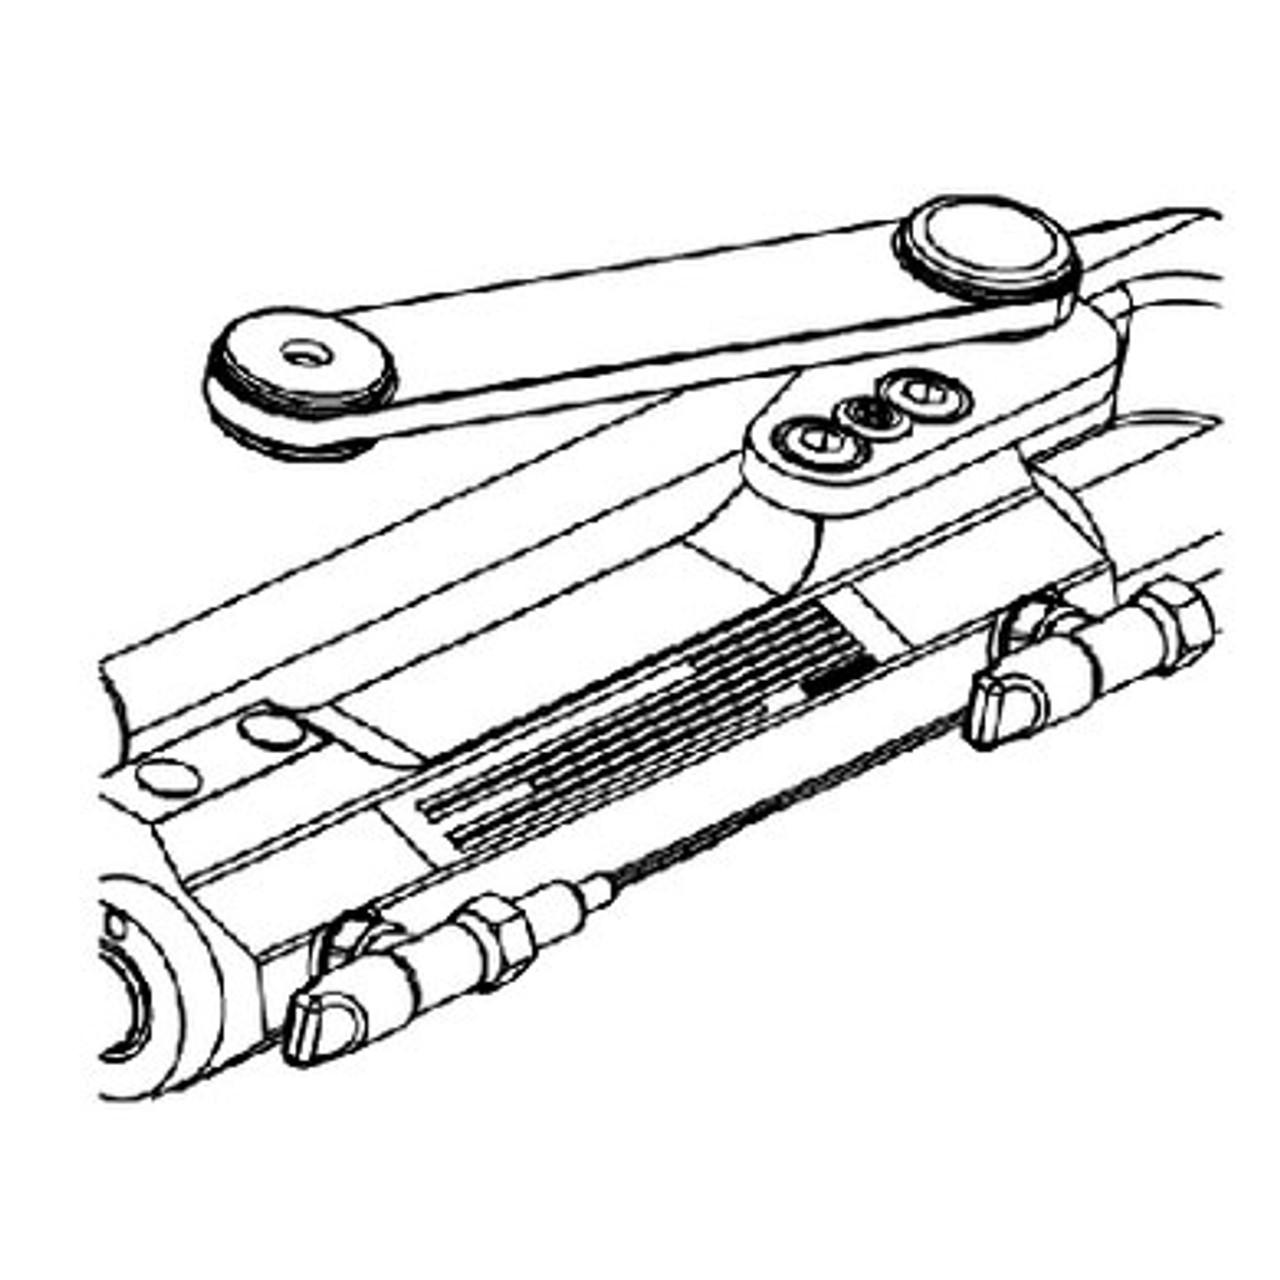 UFLEX 40822X TILLER BOLT KIT MARINE BOAT